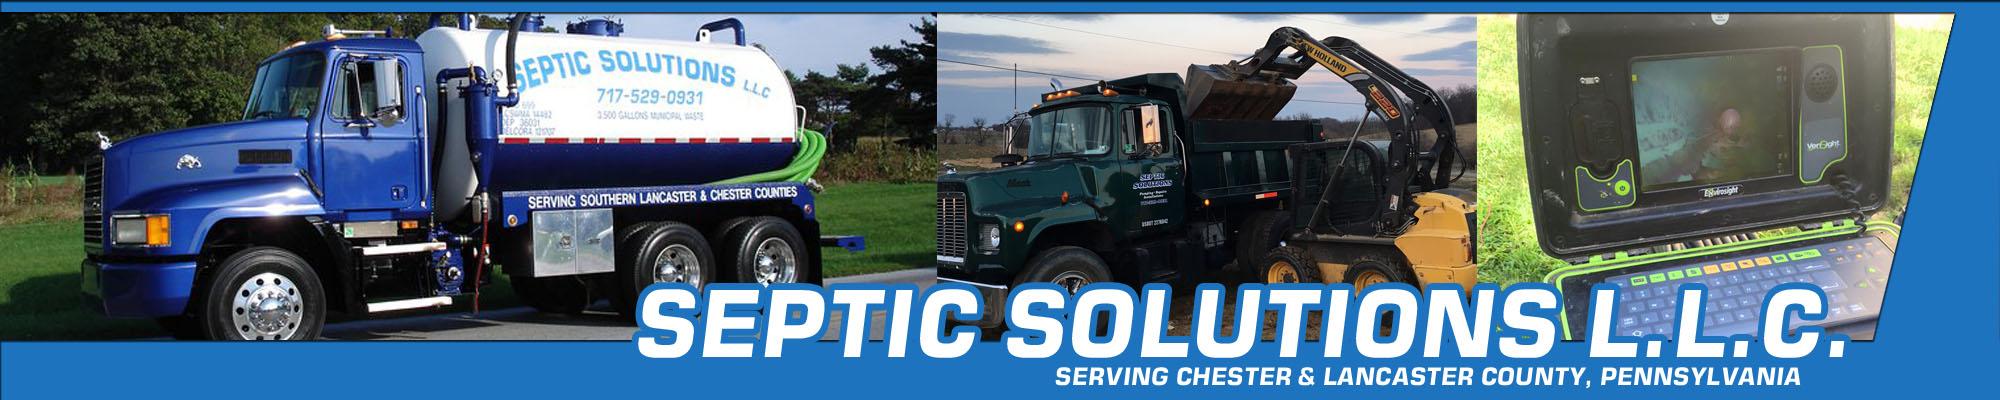 Septic Solutions LLC